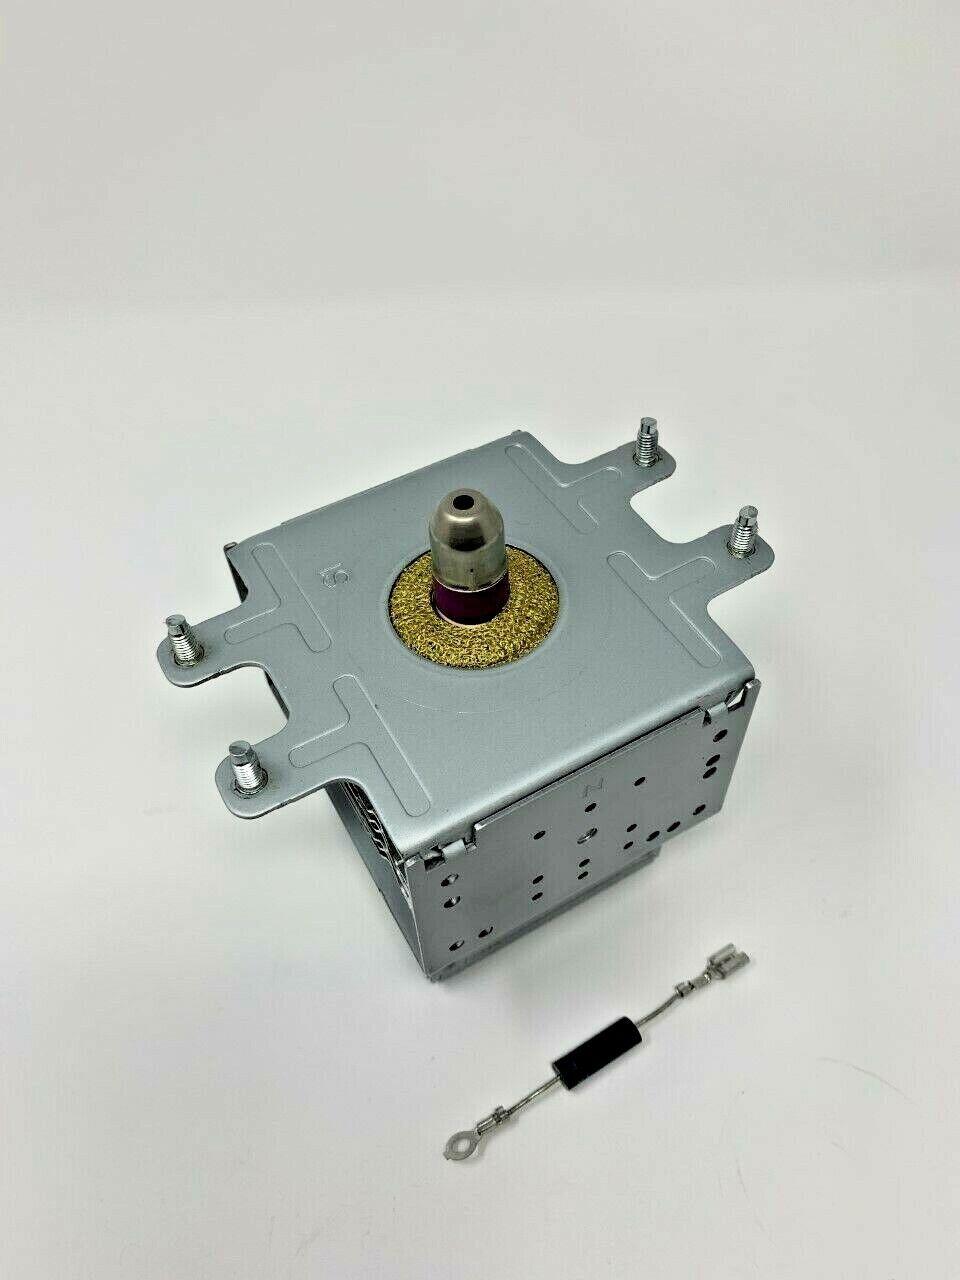 Replacement Magnetron For Samsung Maytag OM75P(10)ESHL OM75P10ESS OM75P10ESHL